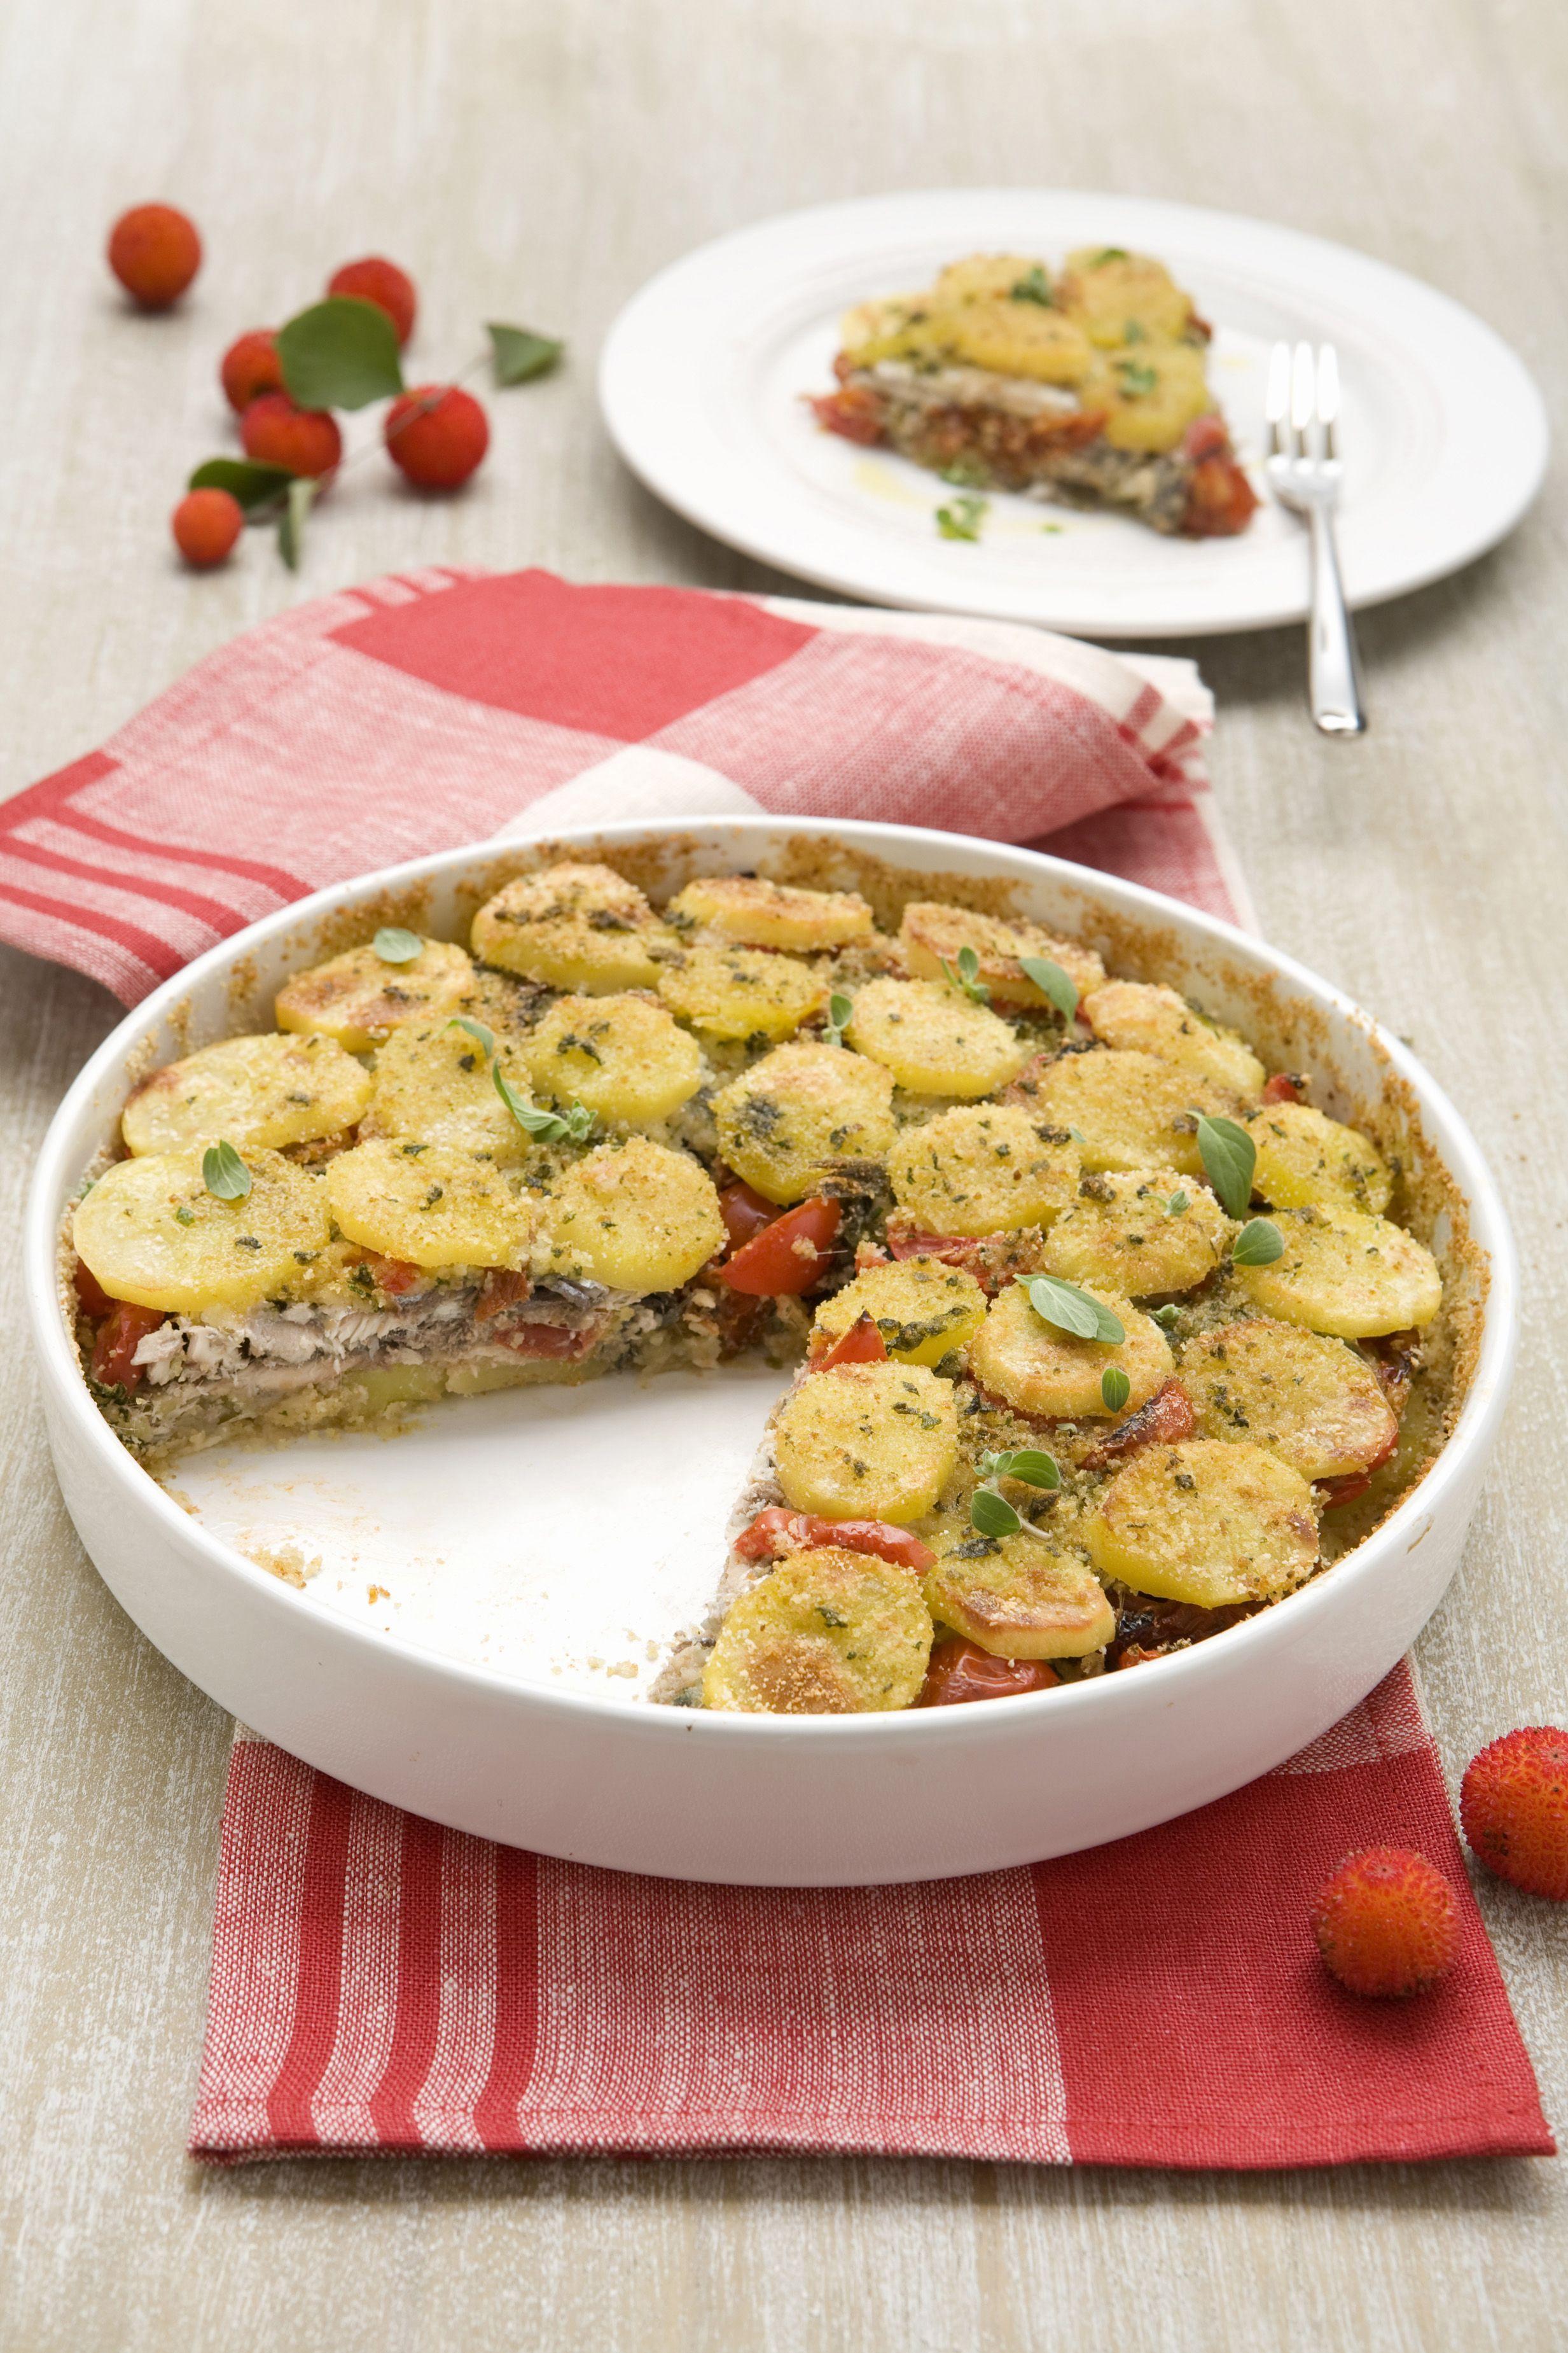 Tortino di patate e acciughe - Scuola di cucina - Donna ...